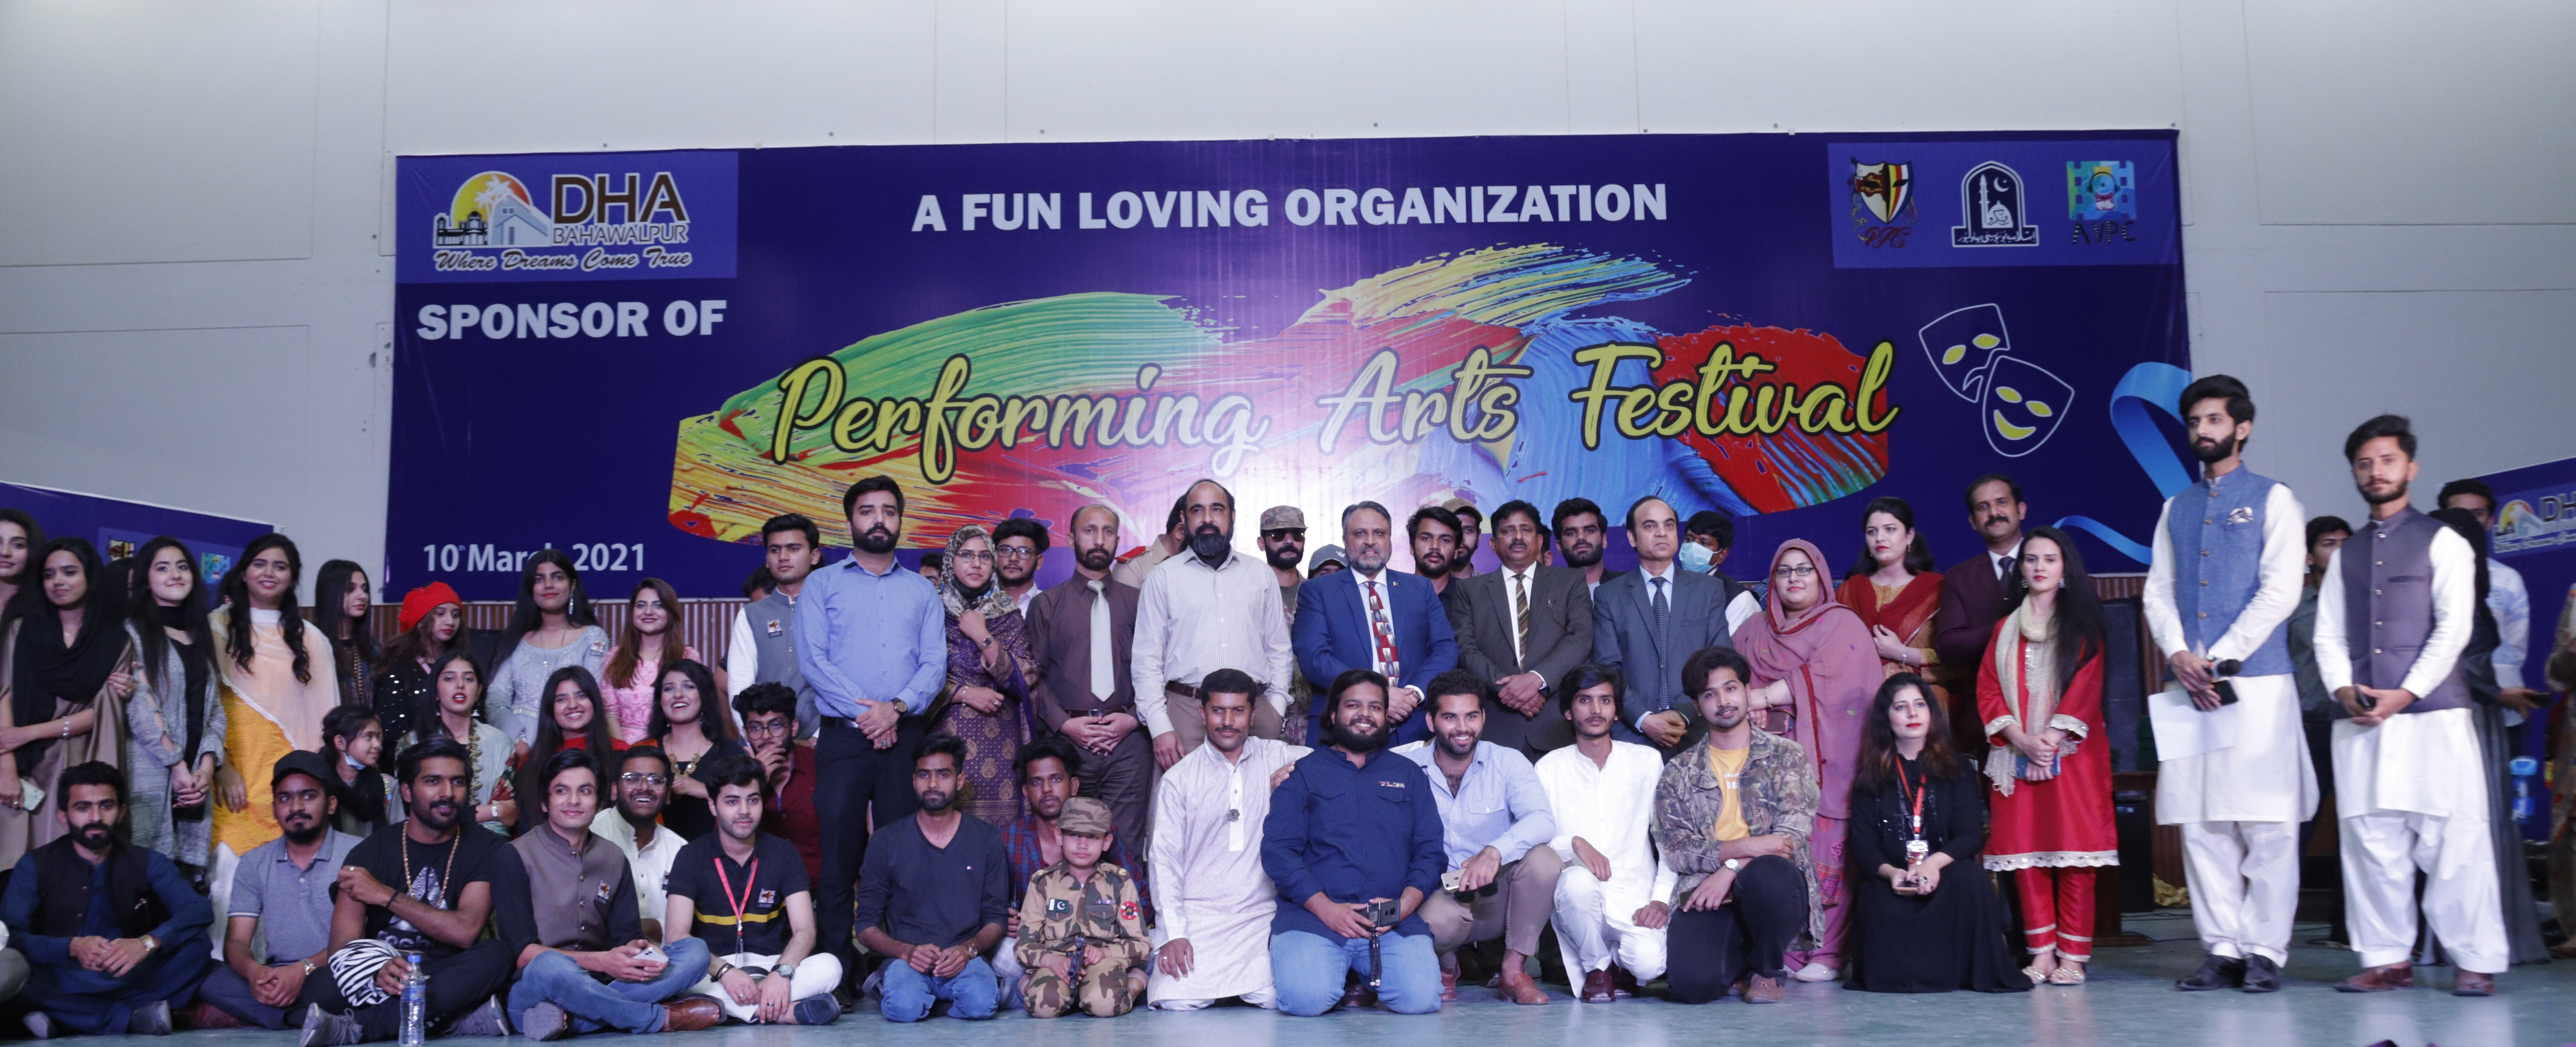 Performing Arts Festival 2021